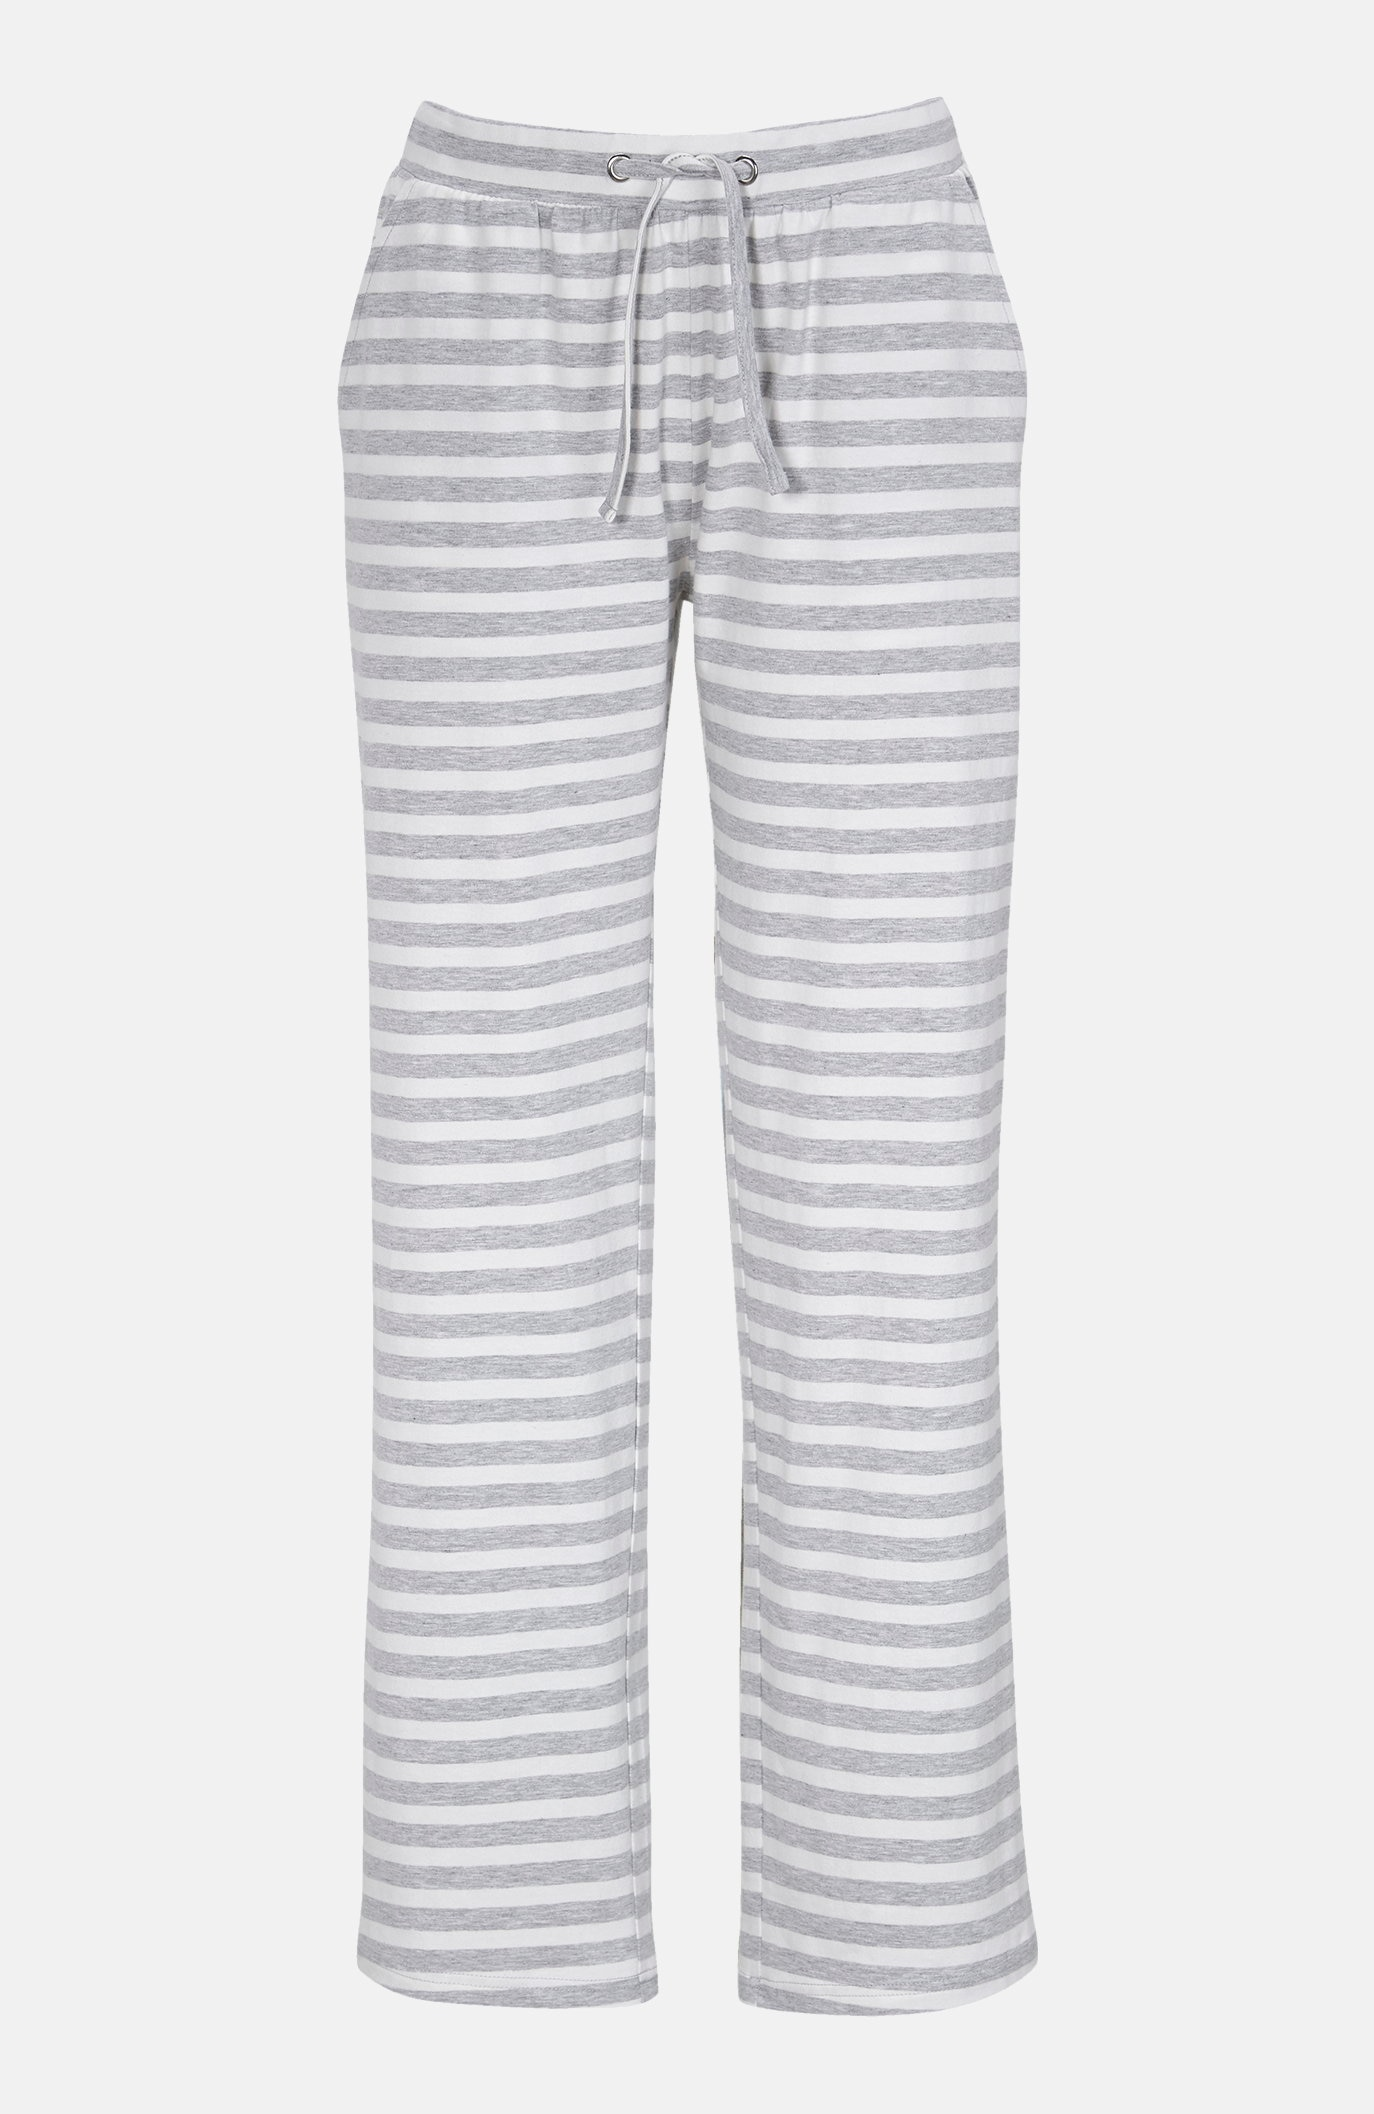 Spodnie od pidżamy